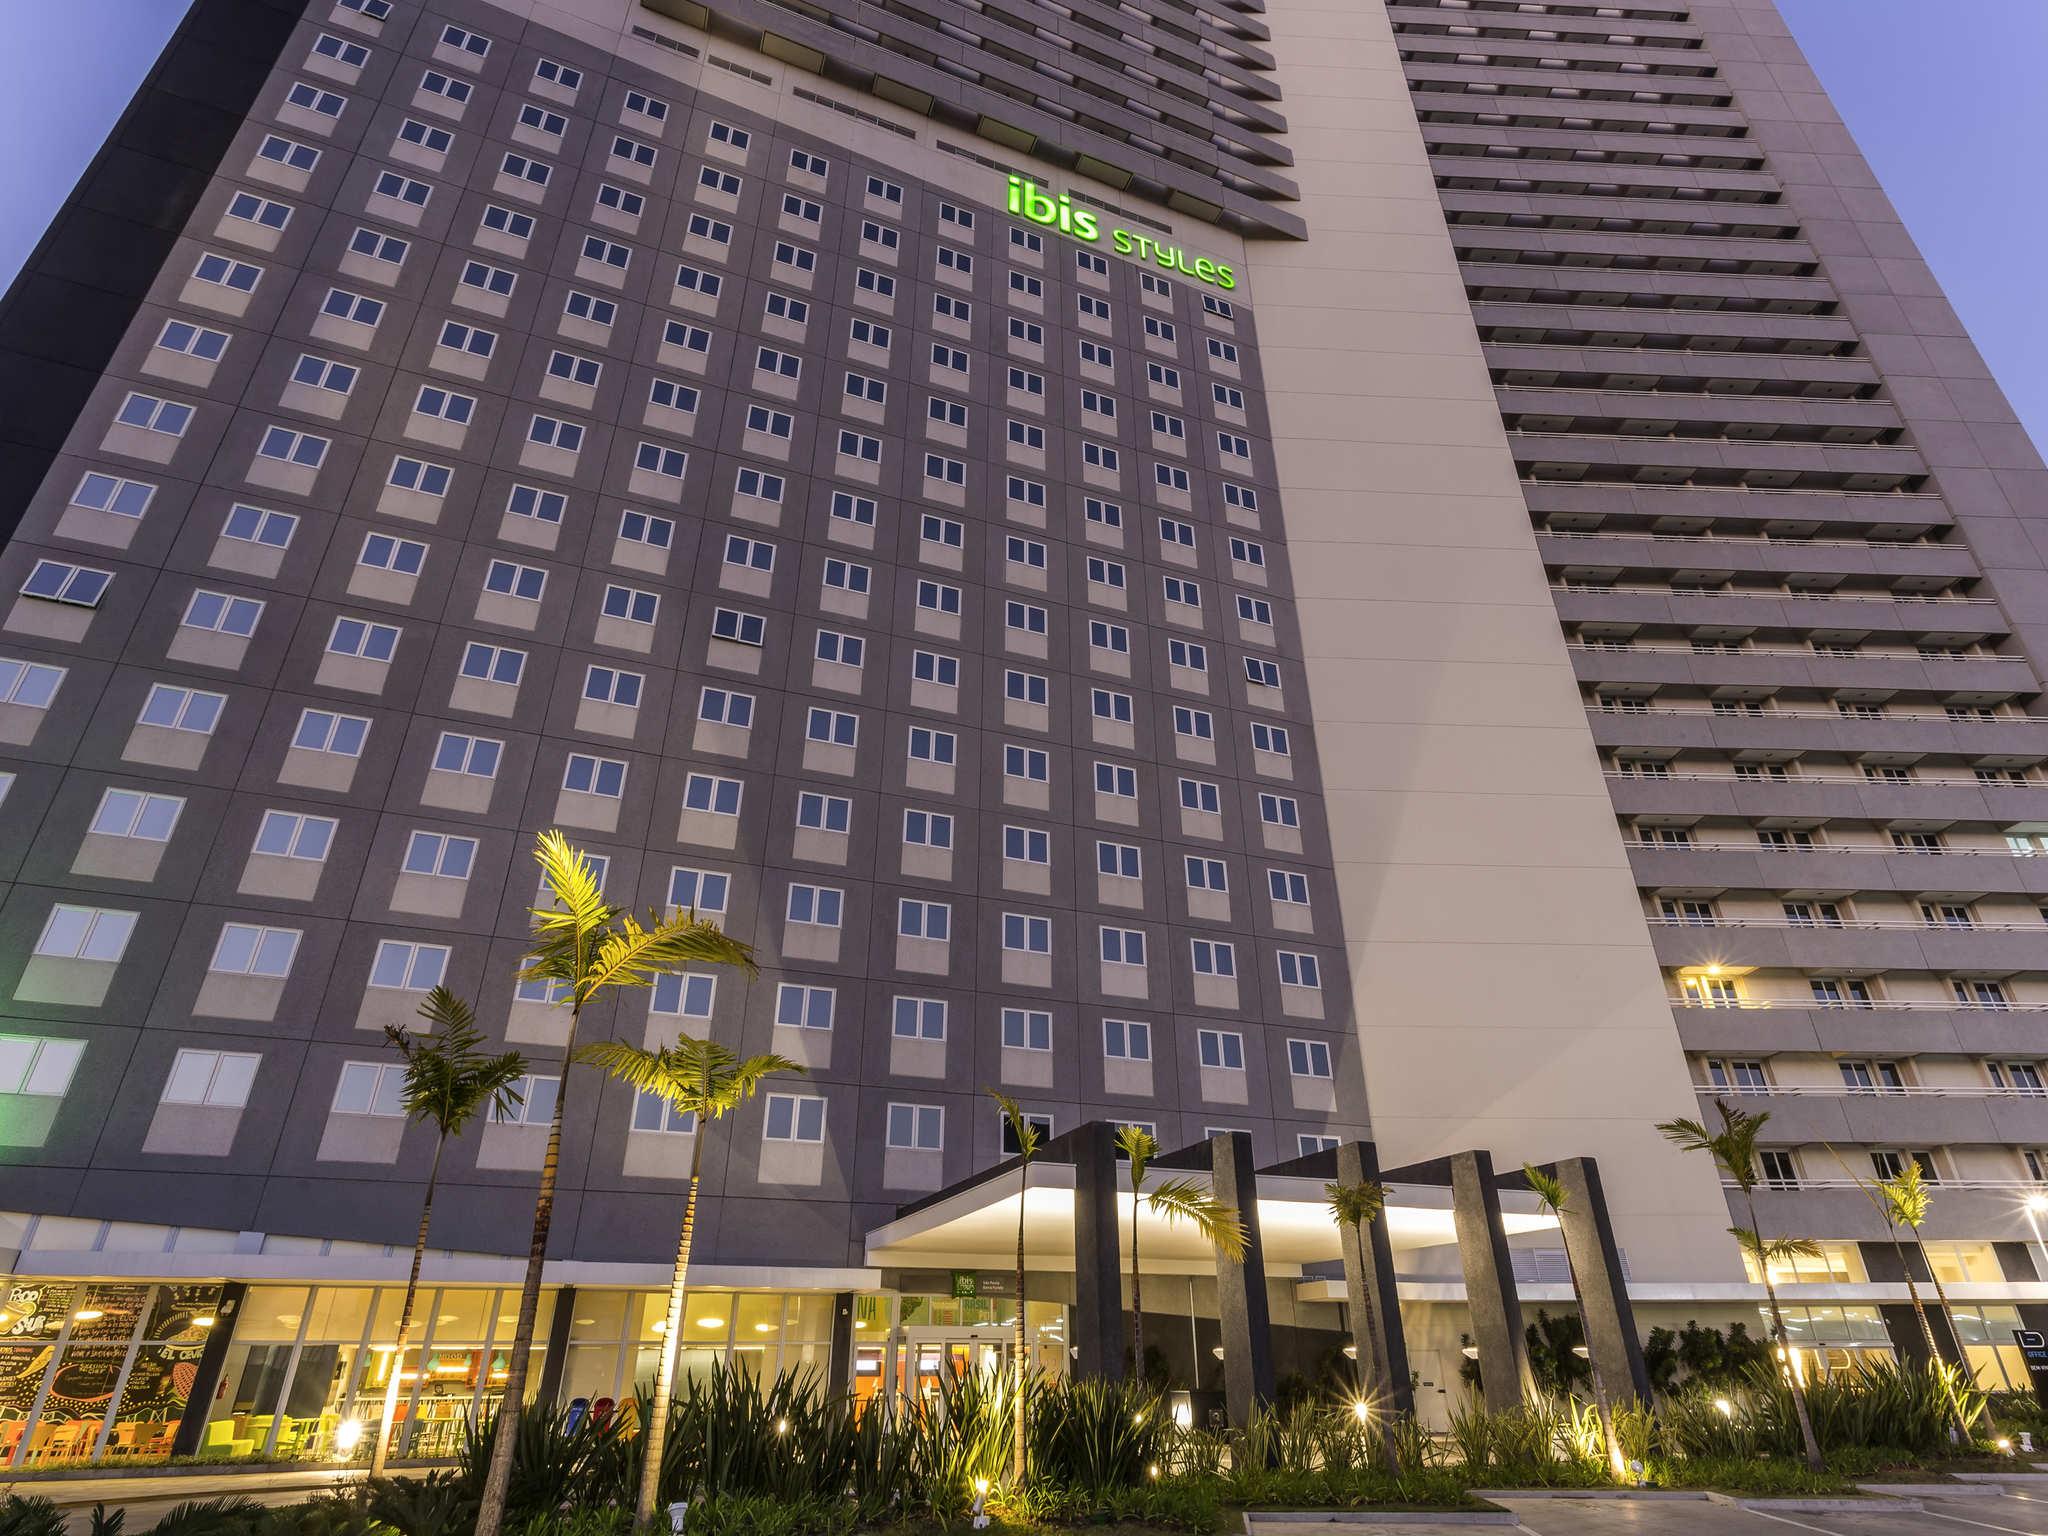 فندق - ibis Styles São Paulo Barra Funda